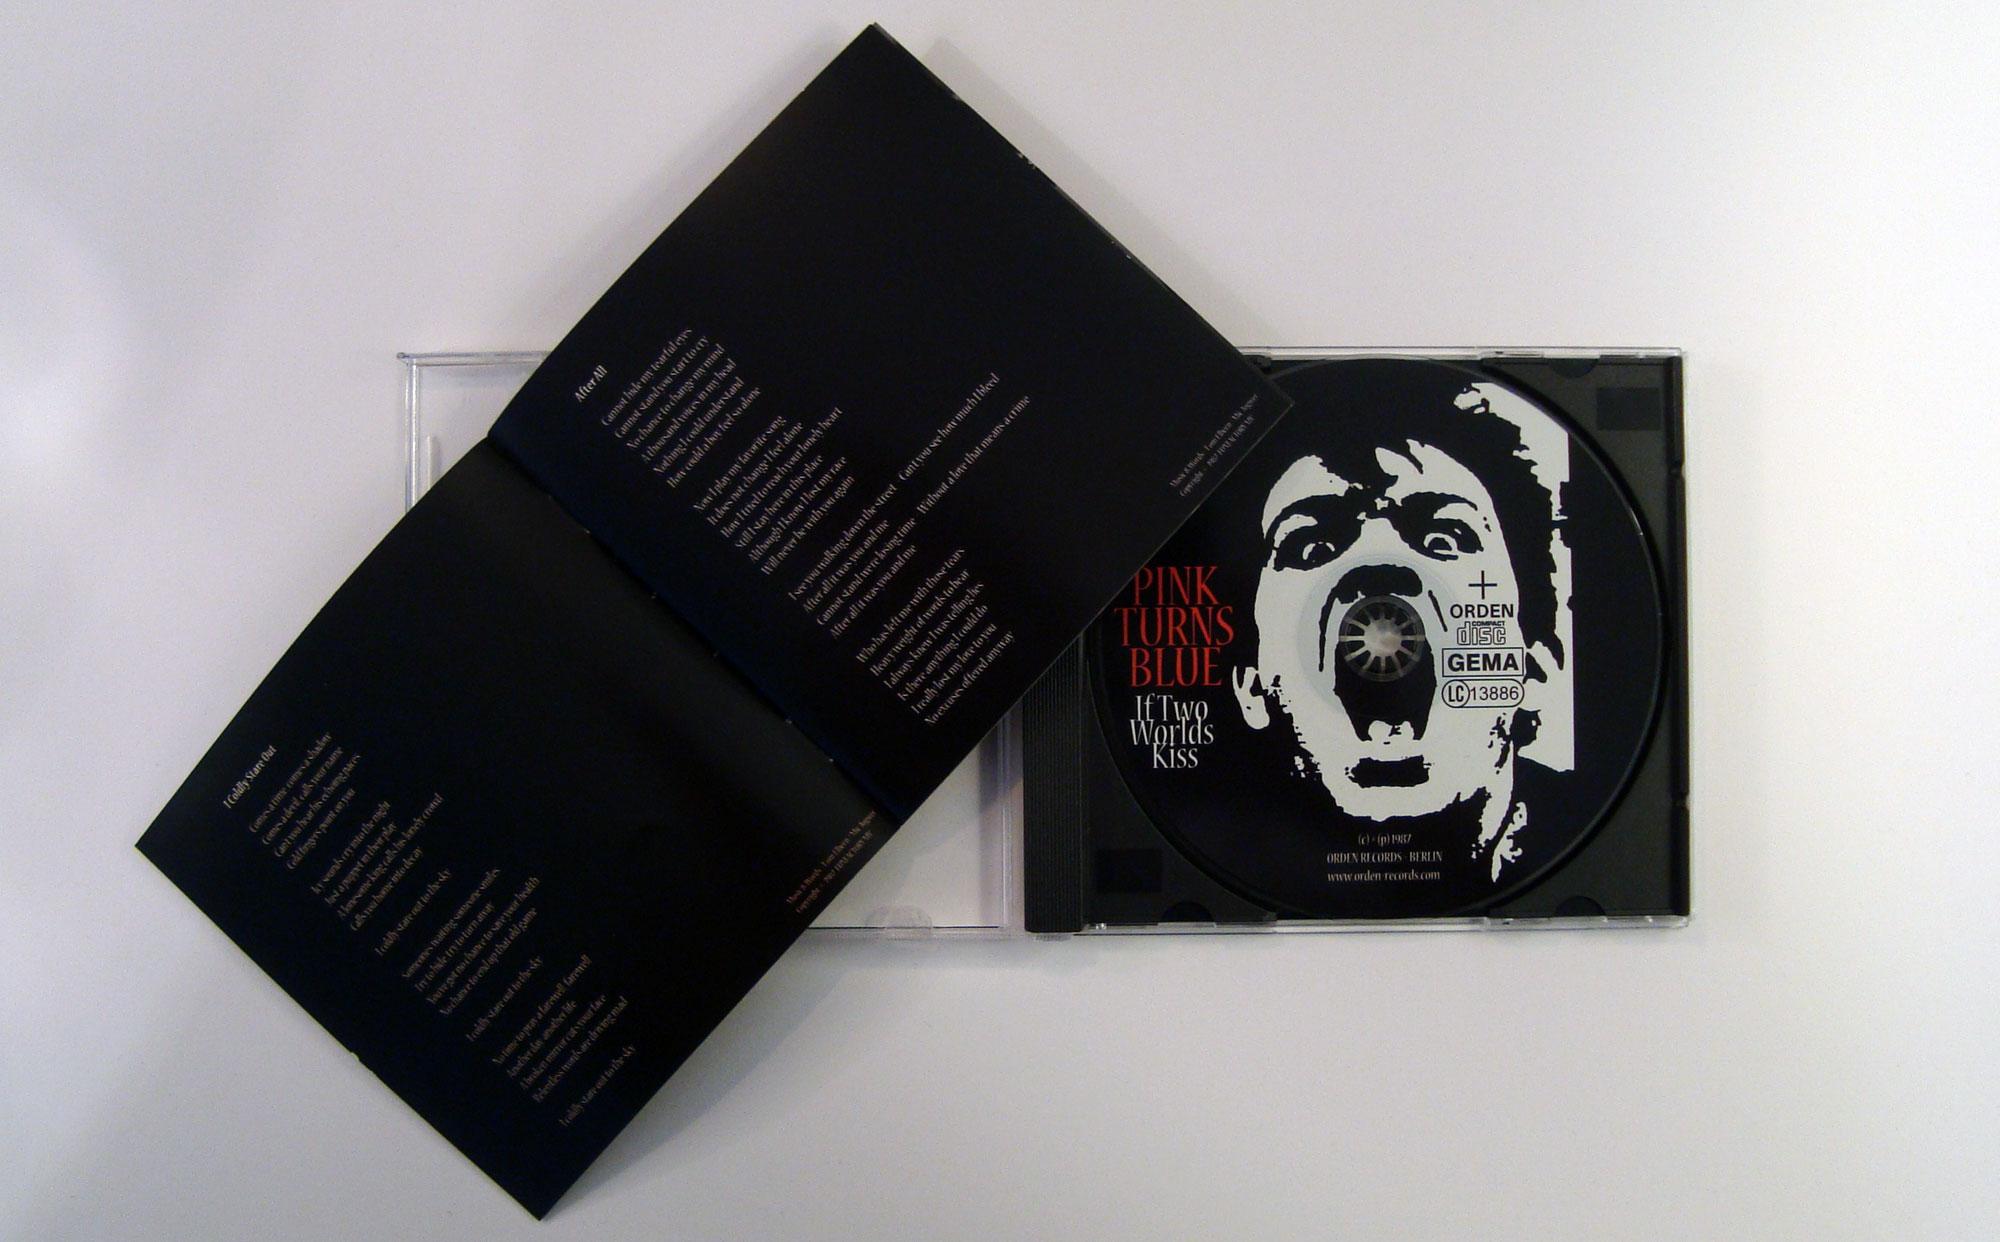 PINK TURNS BLUE - IF TWO WORLDS KISS - CD album - booklet - lyrics